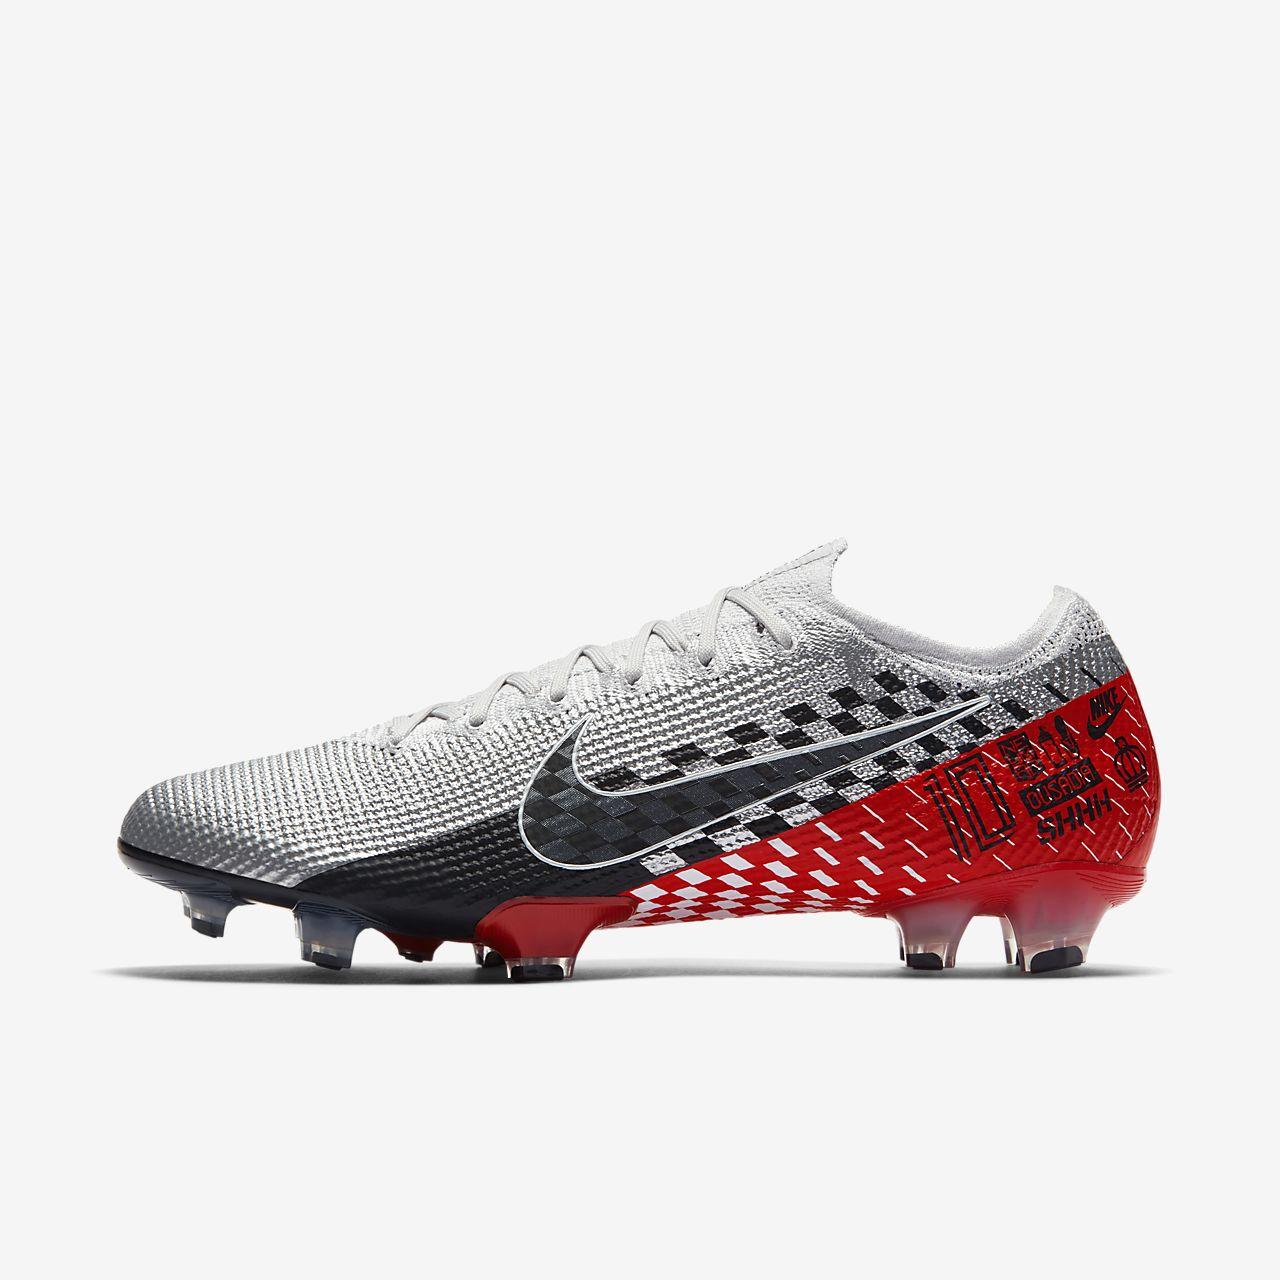 Calzado de fútbol para terreno firme Nike Mercurial Vapor 13 Elite Neymar Jr. FG